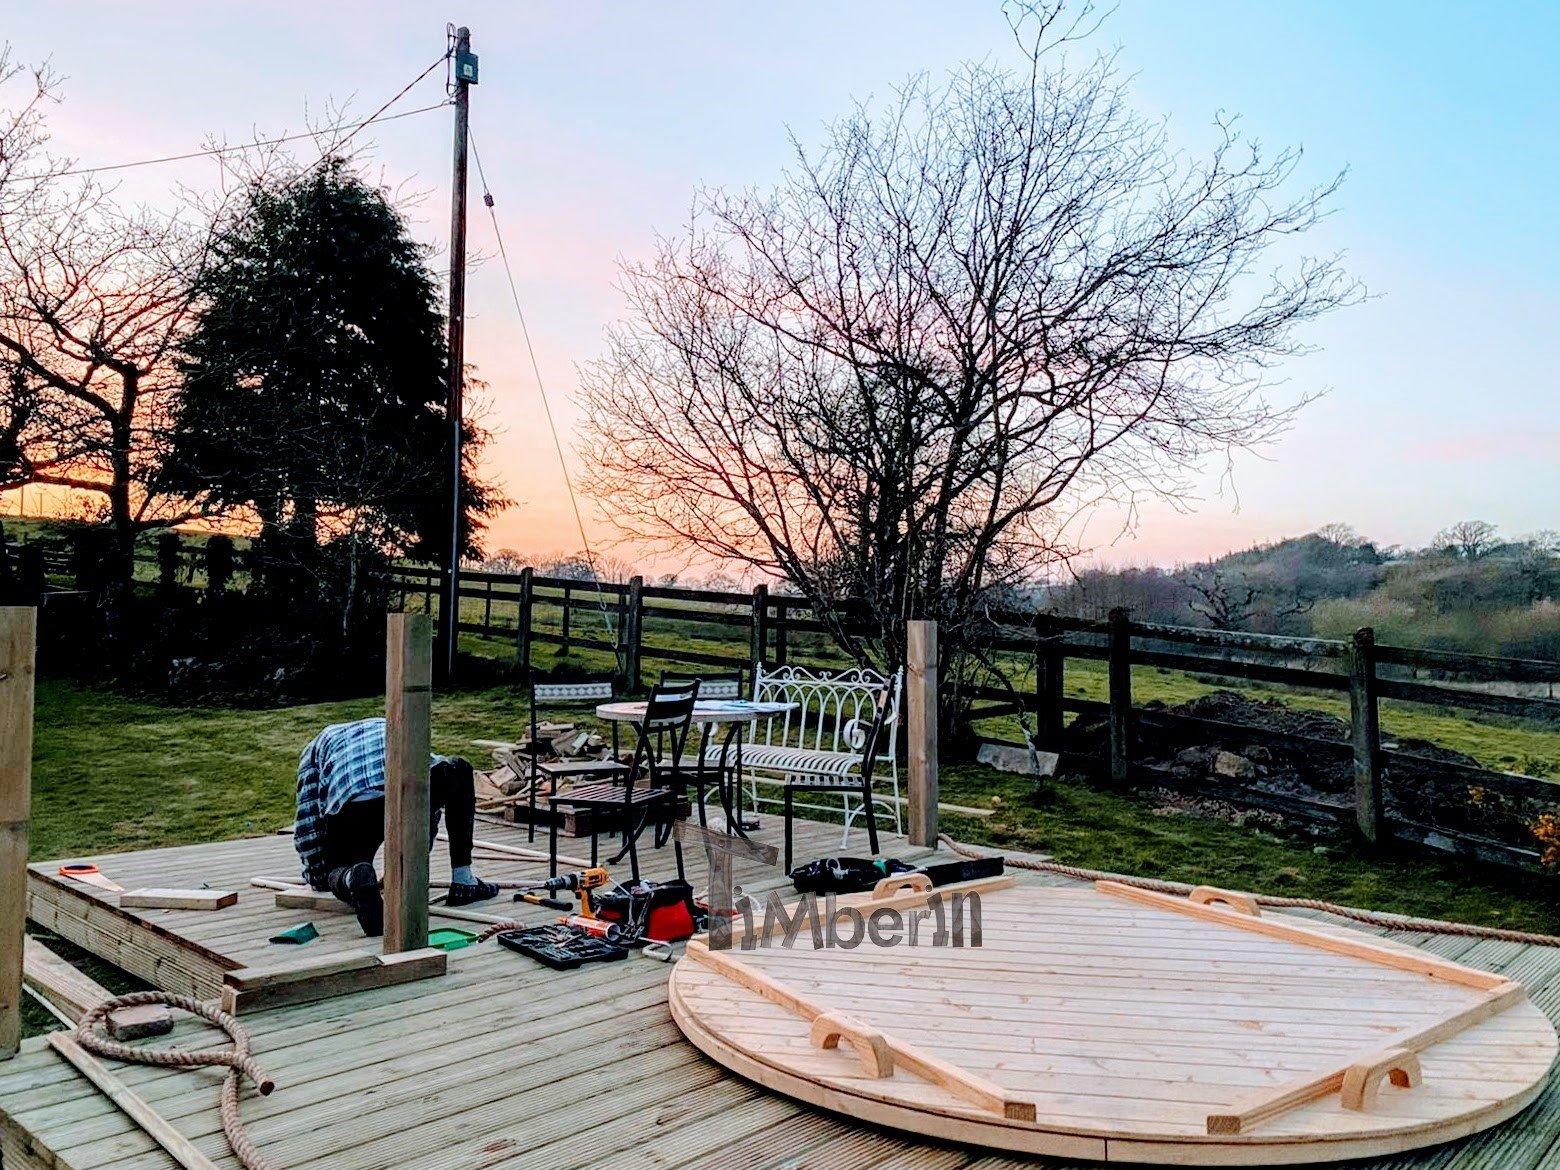 Sunken terrace fiberglass Jacuzzi Ryan Launceston United Kingdom 2